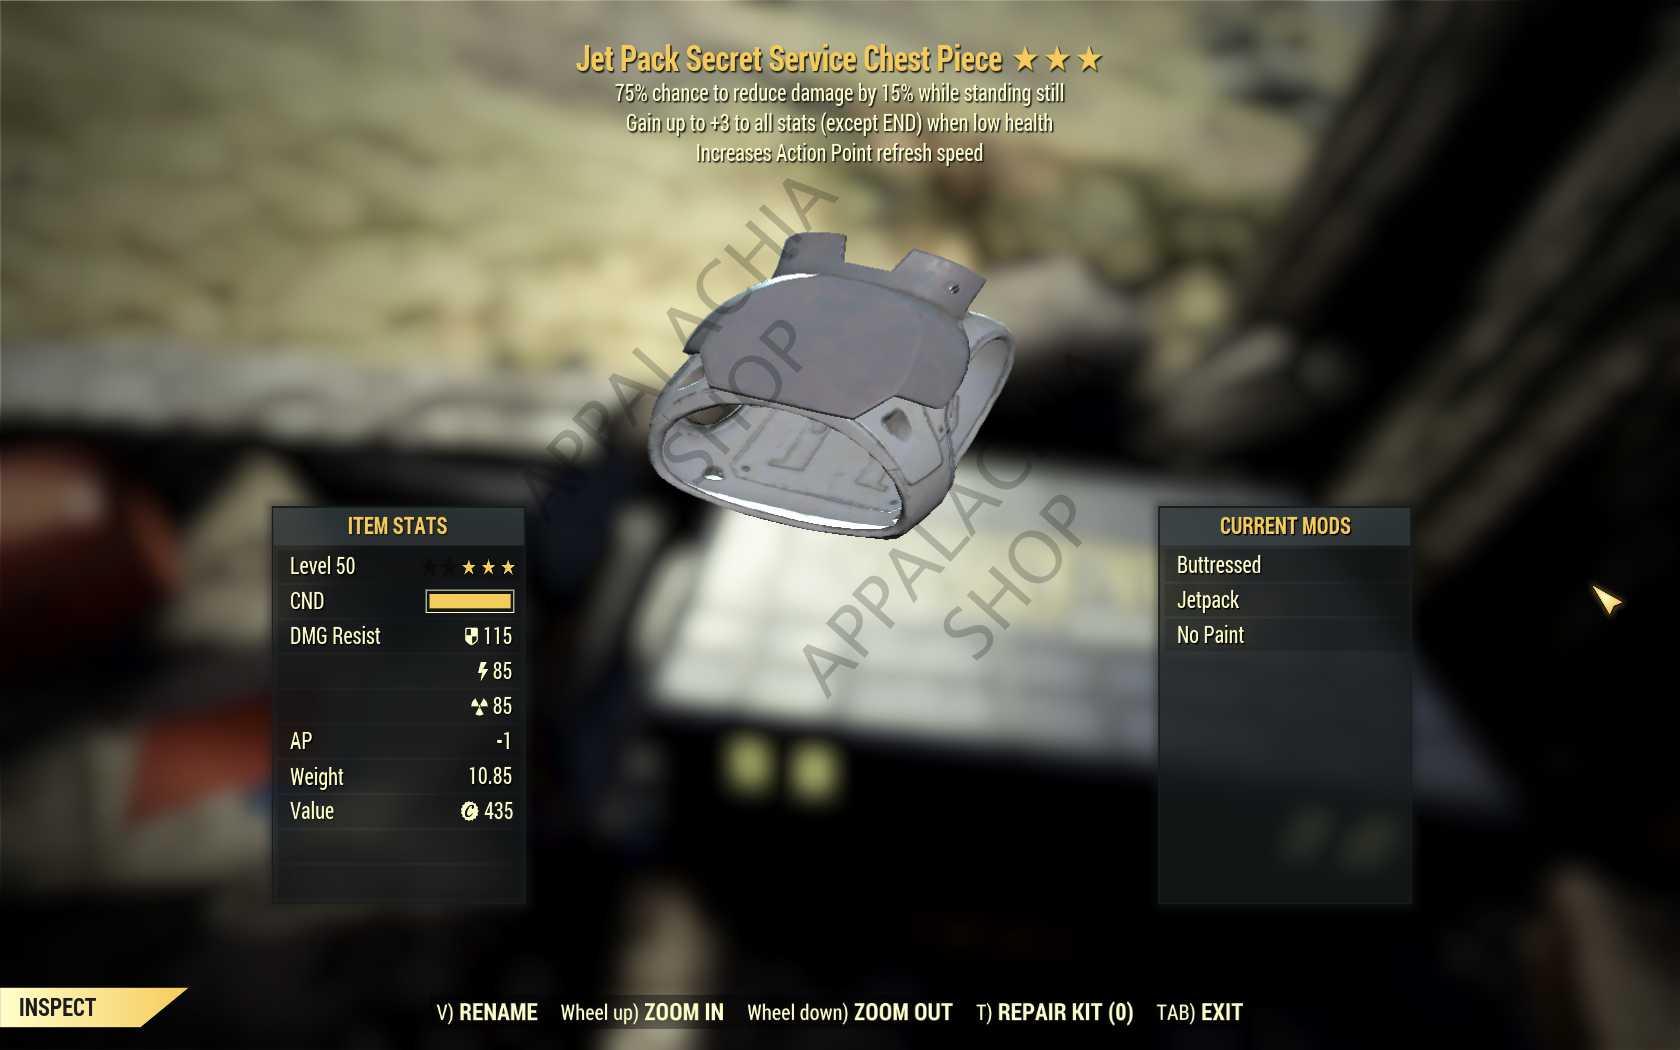 Unyielding Secret Service Sentinel Armor Set (FULL AP REFRESH 5/5)[FULL Mods + Jetpack] (Wastelander